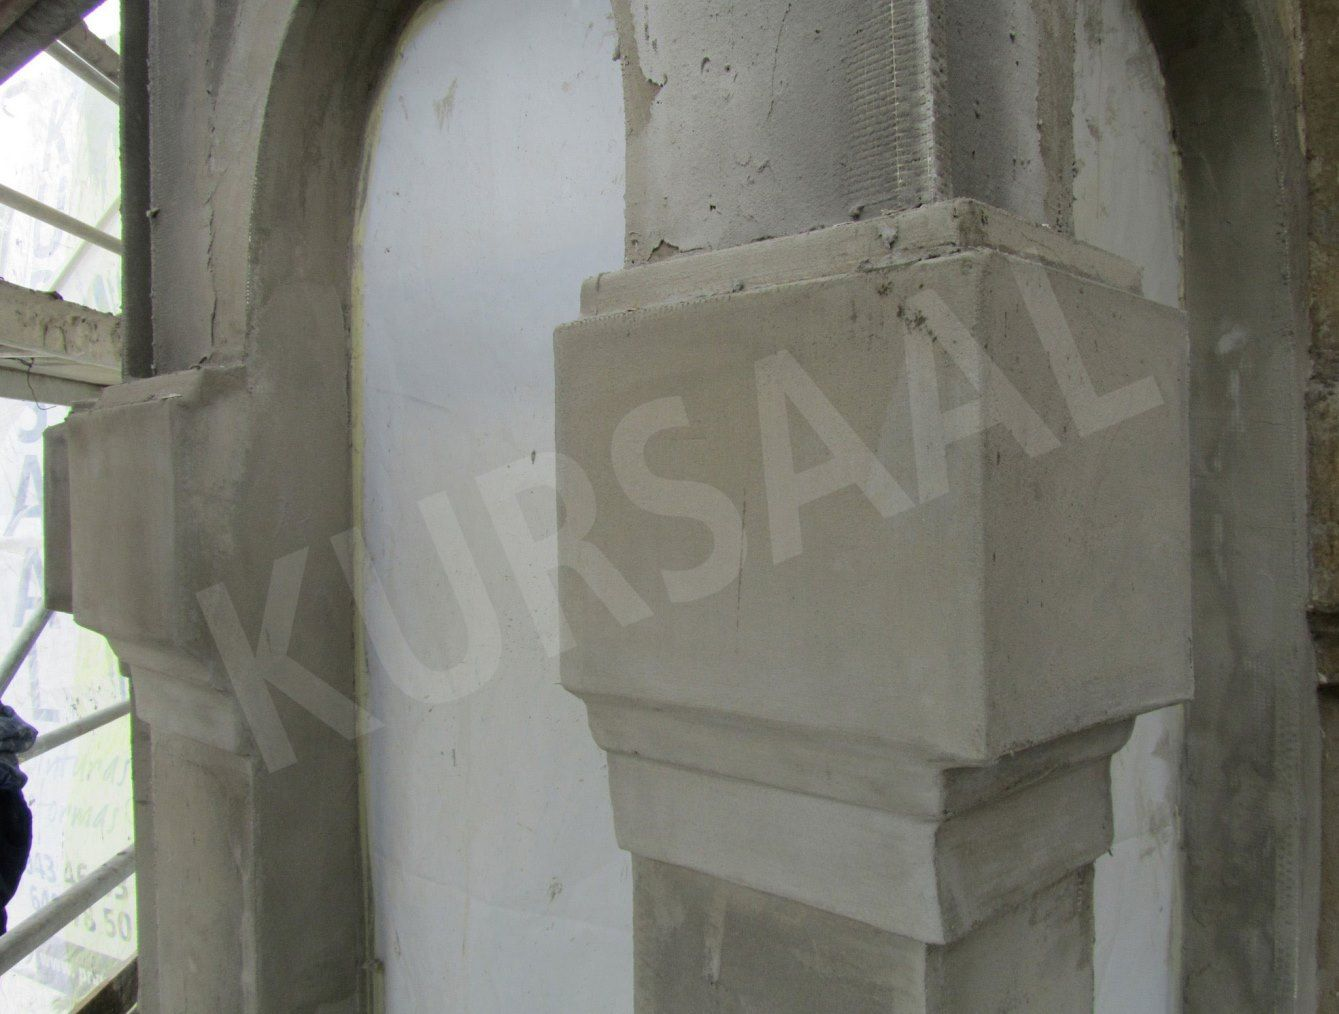 foto 7 - Restauración y patrimonio-Soraluze 1 (La Artesana)-DONOSTIA, GIPUZKOA